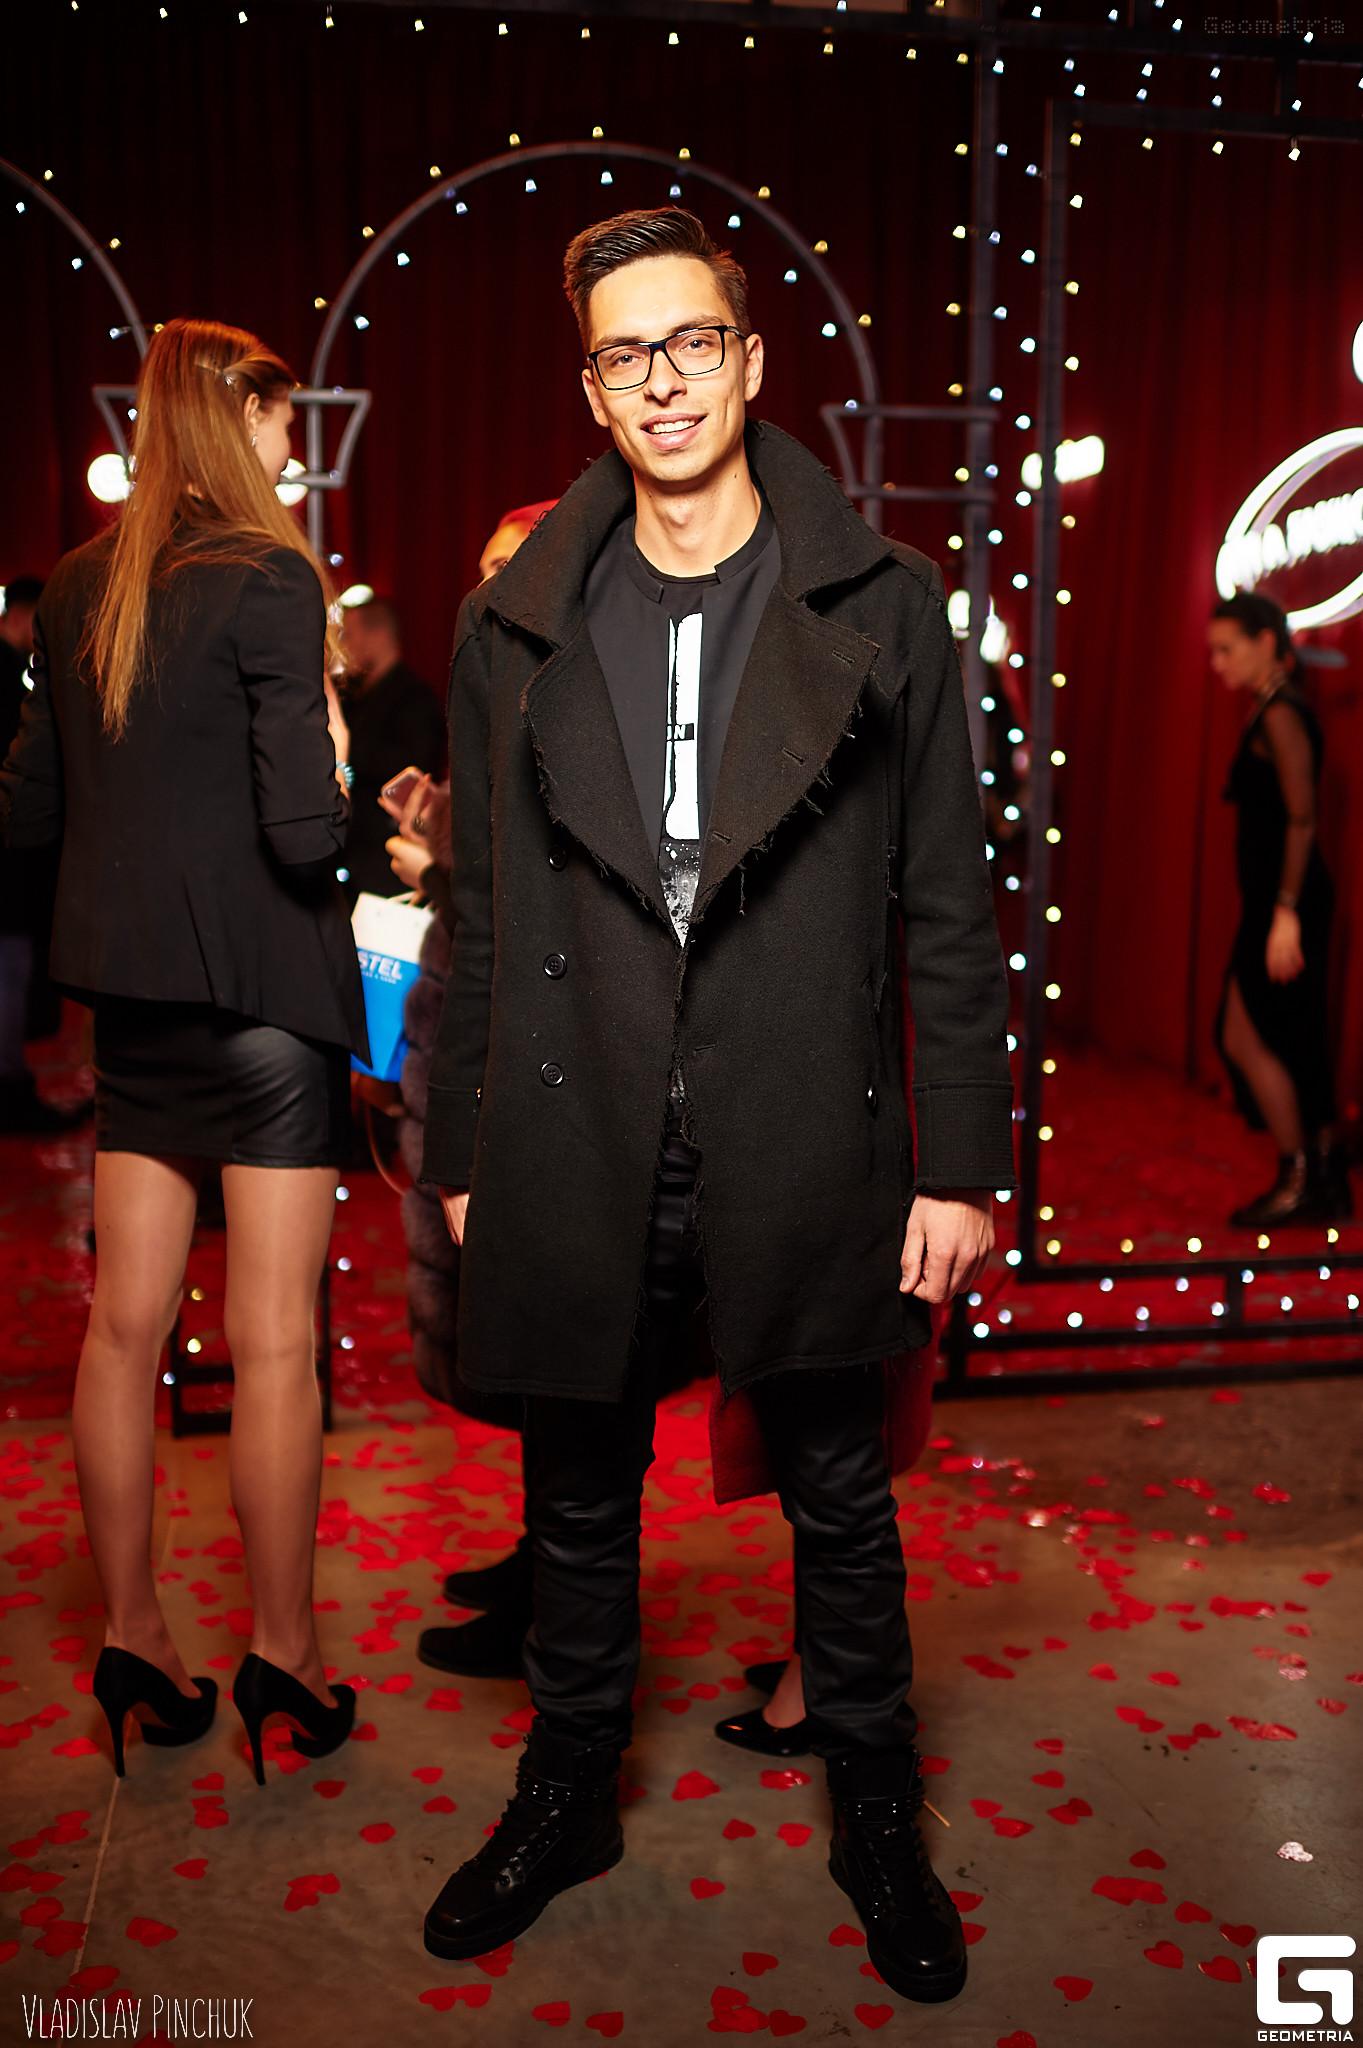 Ведущий Андрей Черновол Fashion Week